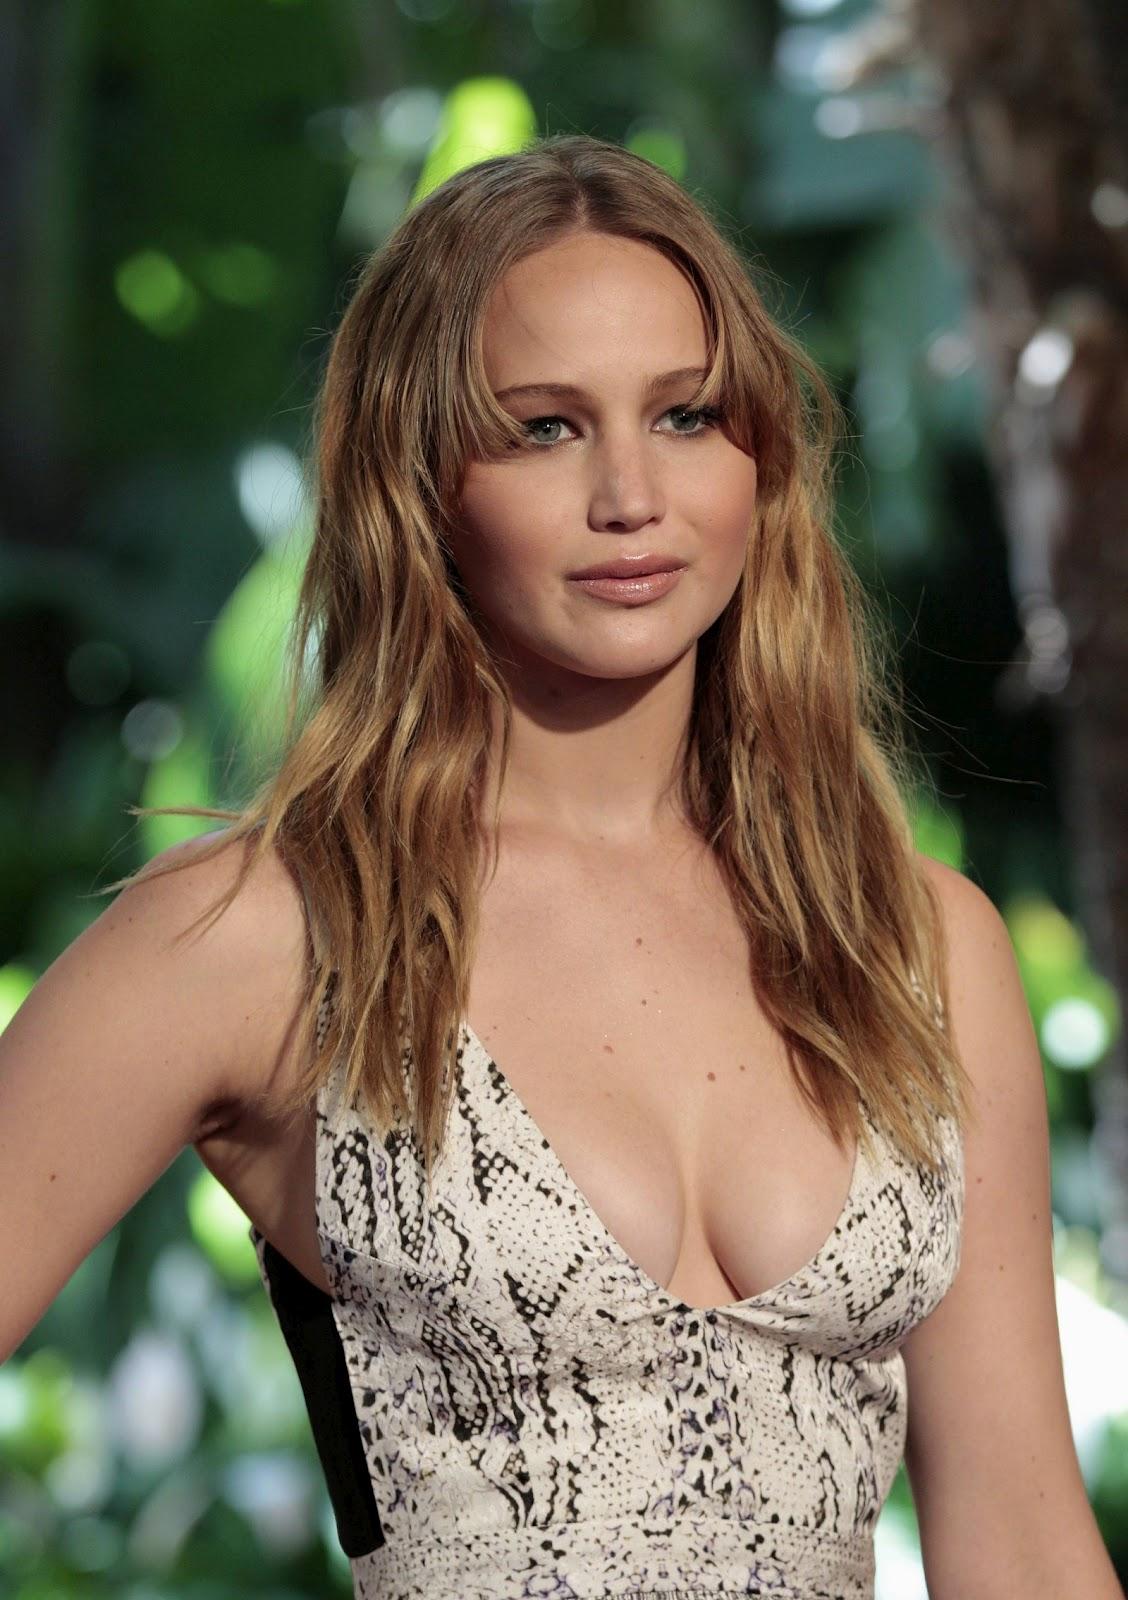 http://1.bp.blogspot.com/-EAdV9ALmdN4/UCkK_N0w5eI/AAAAAAAAGDY/E8QkUMDXtD4/s1600/Jennifer-Lawrence-51.jpg